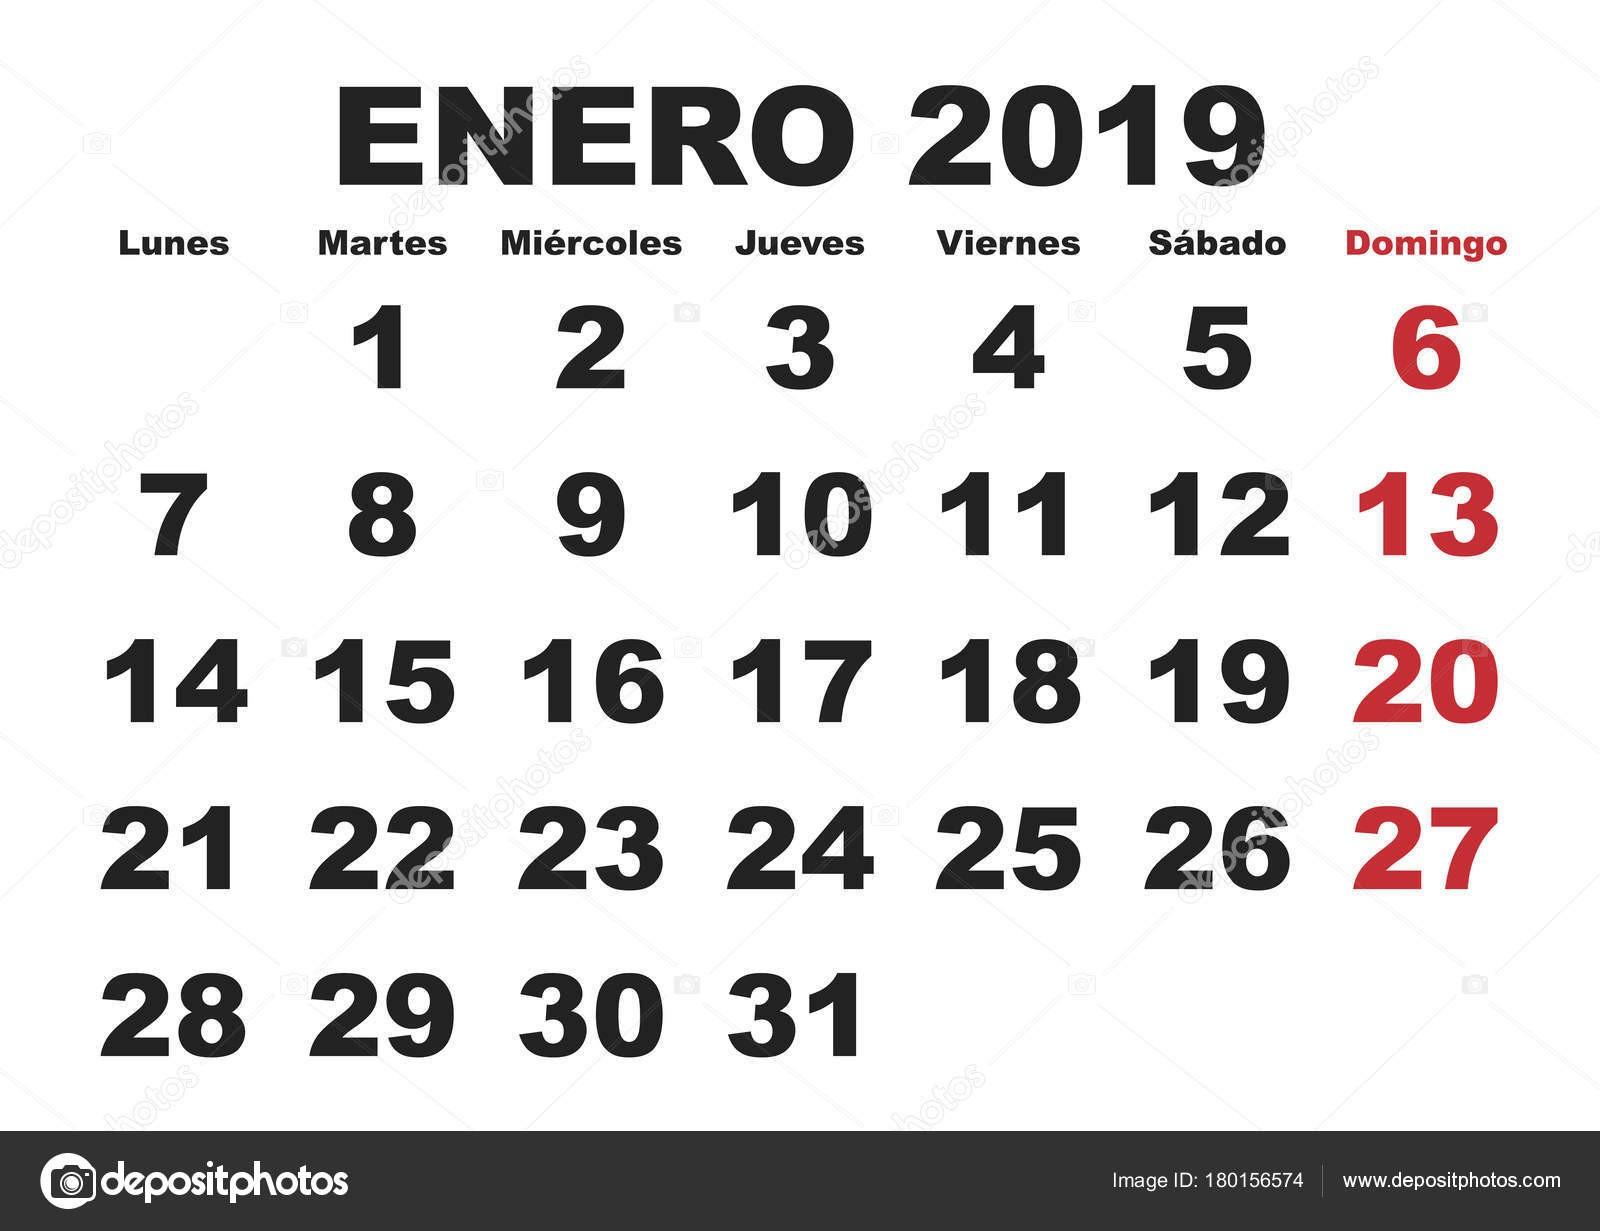 depositphotos stock illustration enero 2019 wall calendar spanish